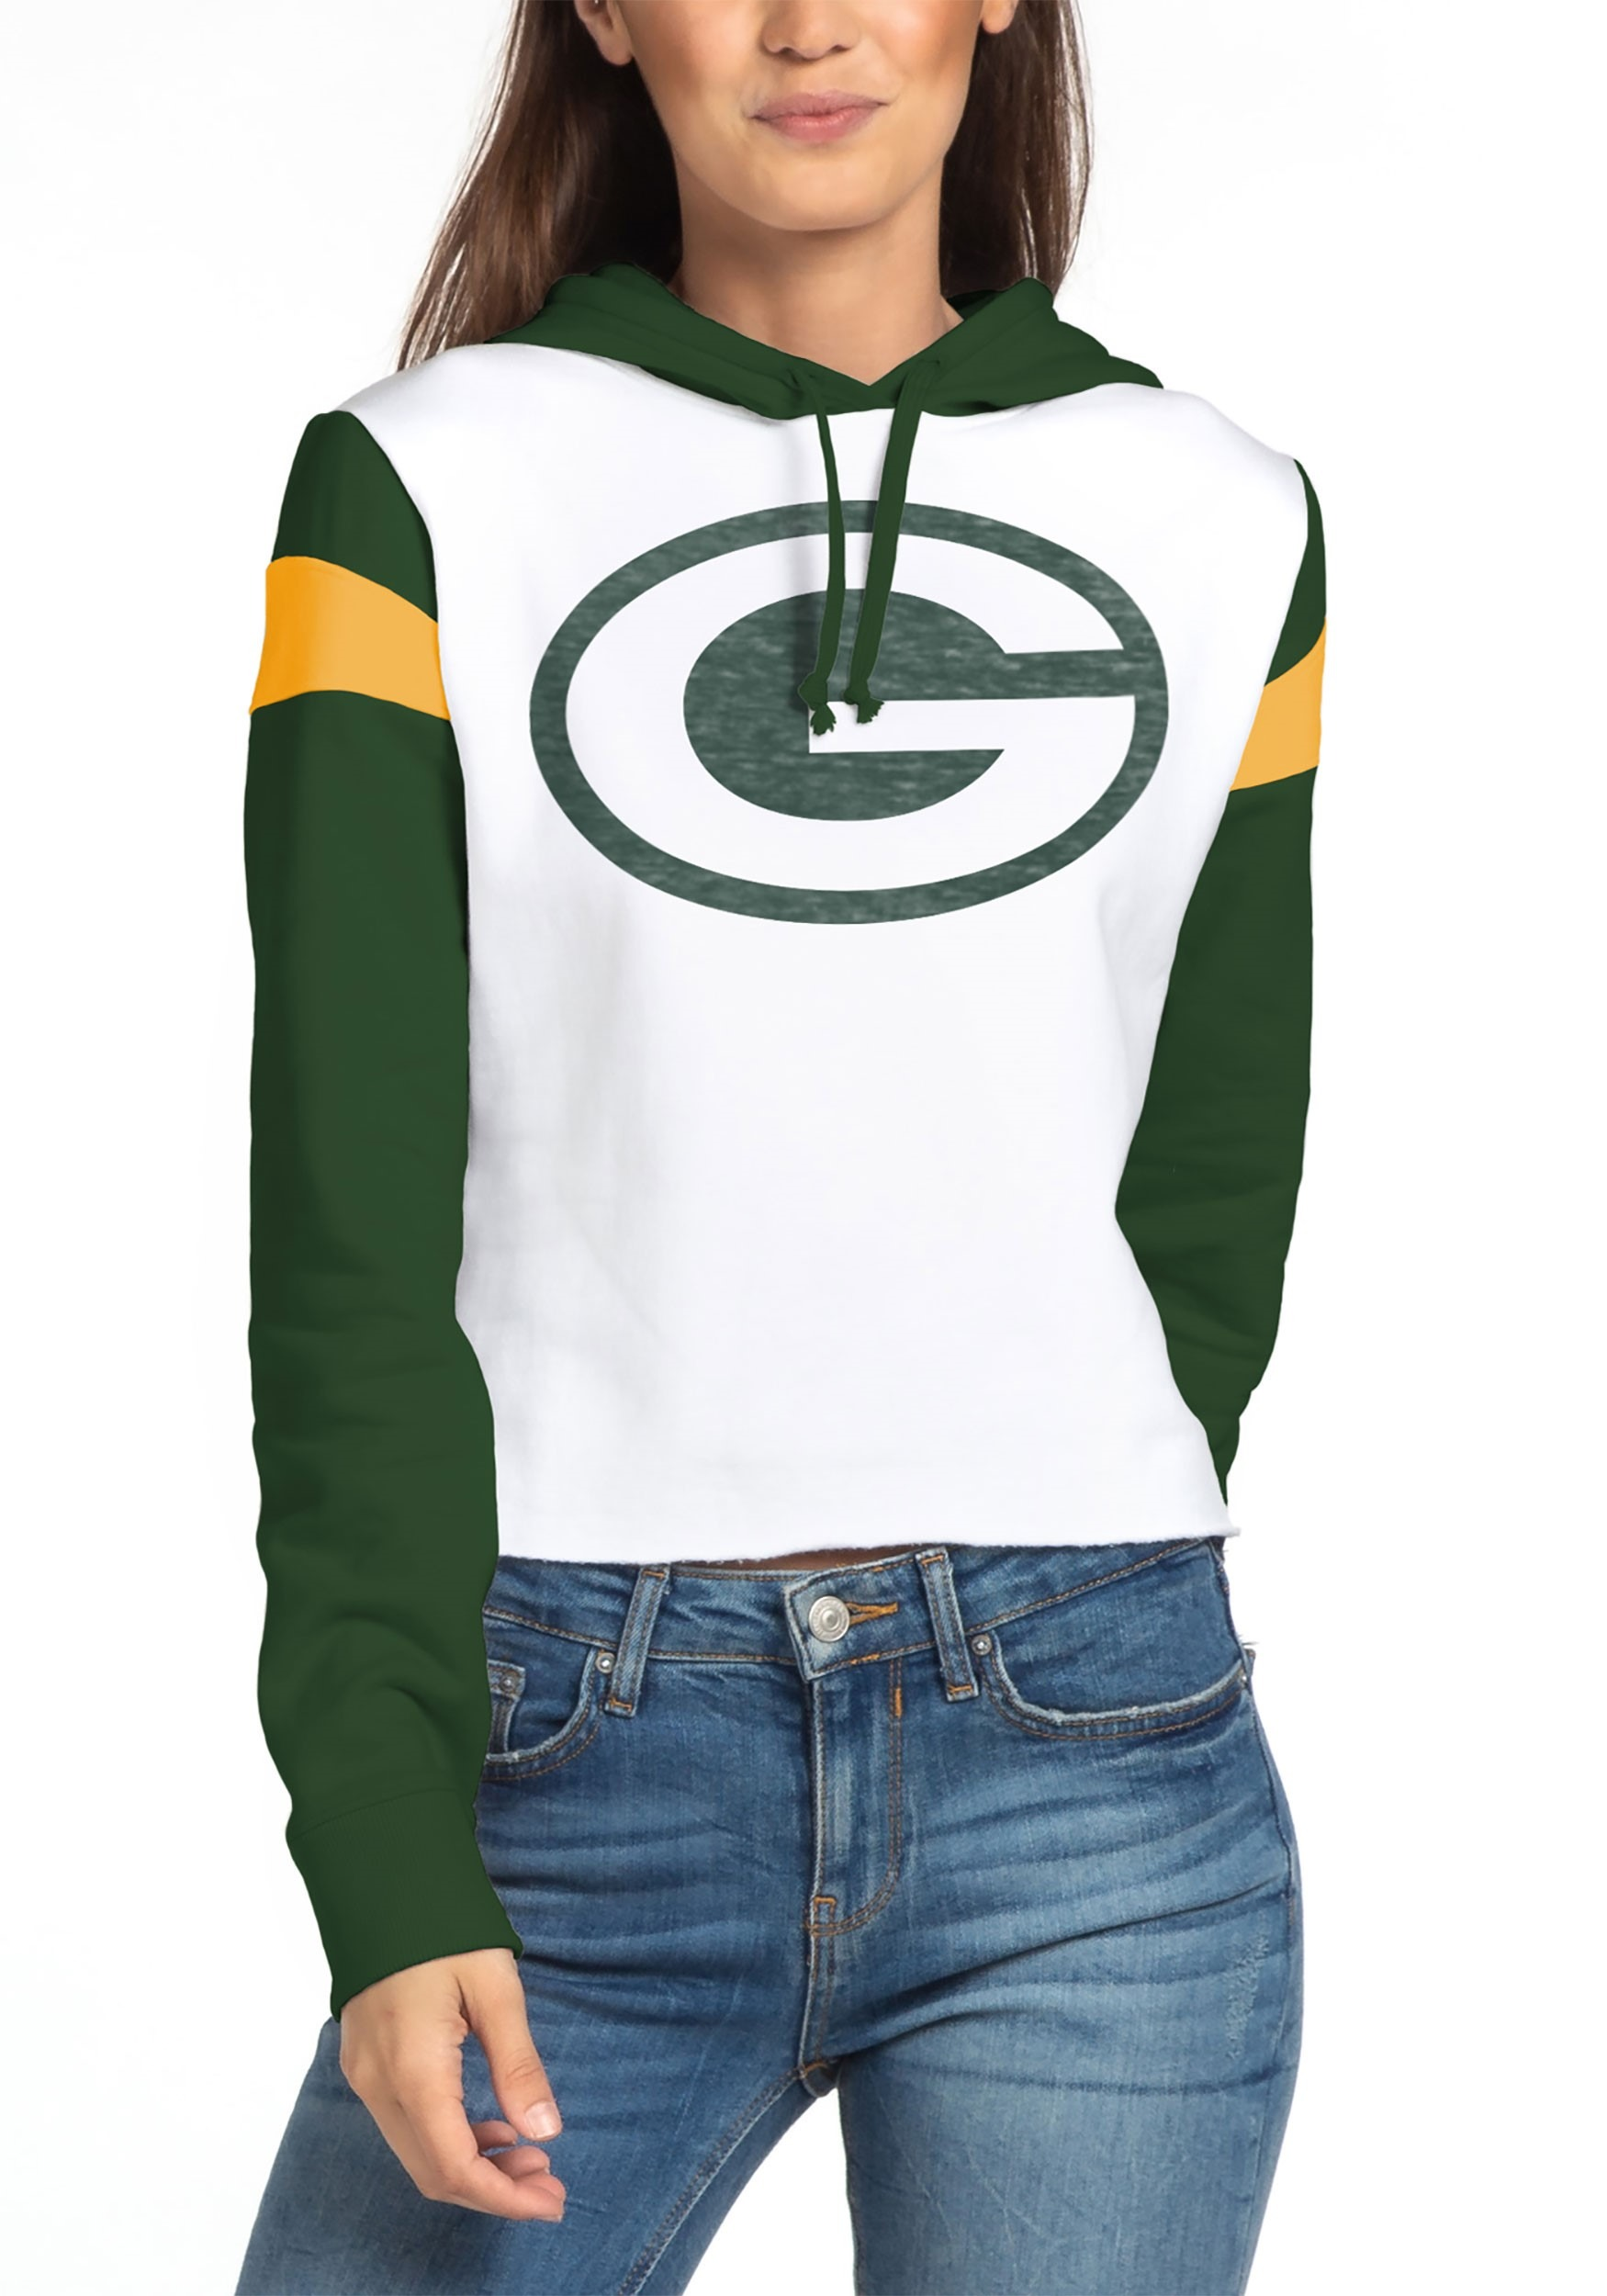 Fleece Womens Green Bay Packers Cropped Hoodie